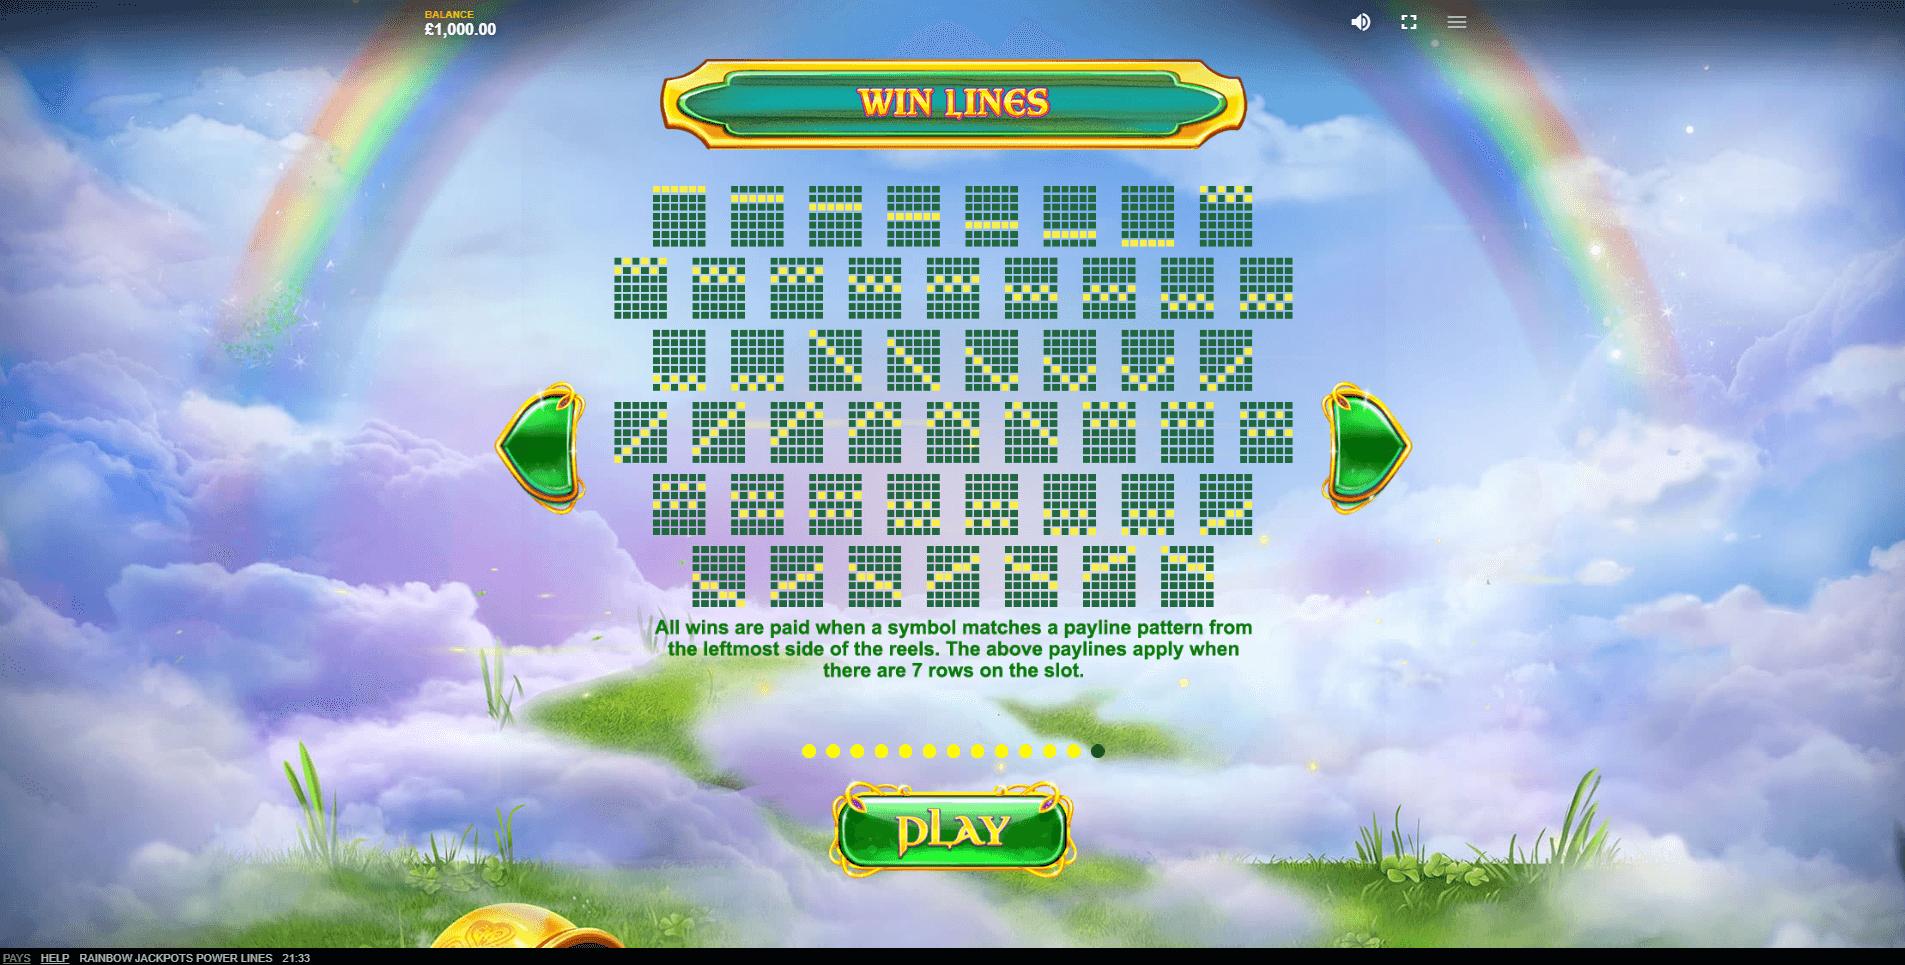 Rainbow Jackpots Power Lines Slot Machine